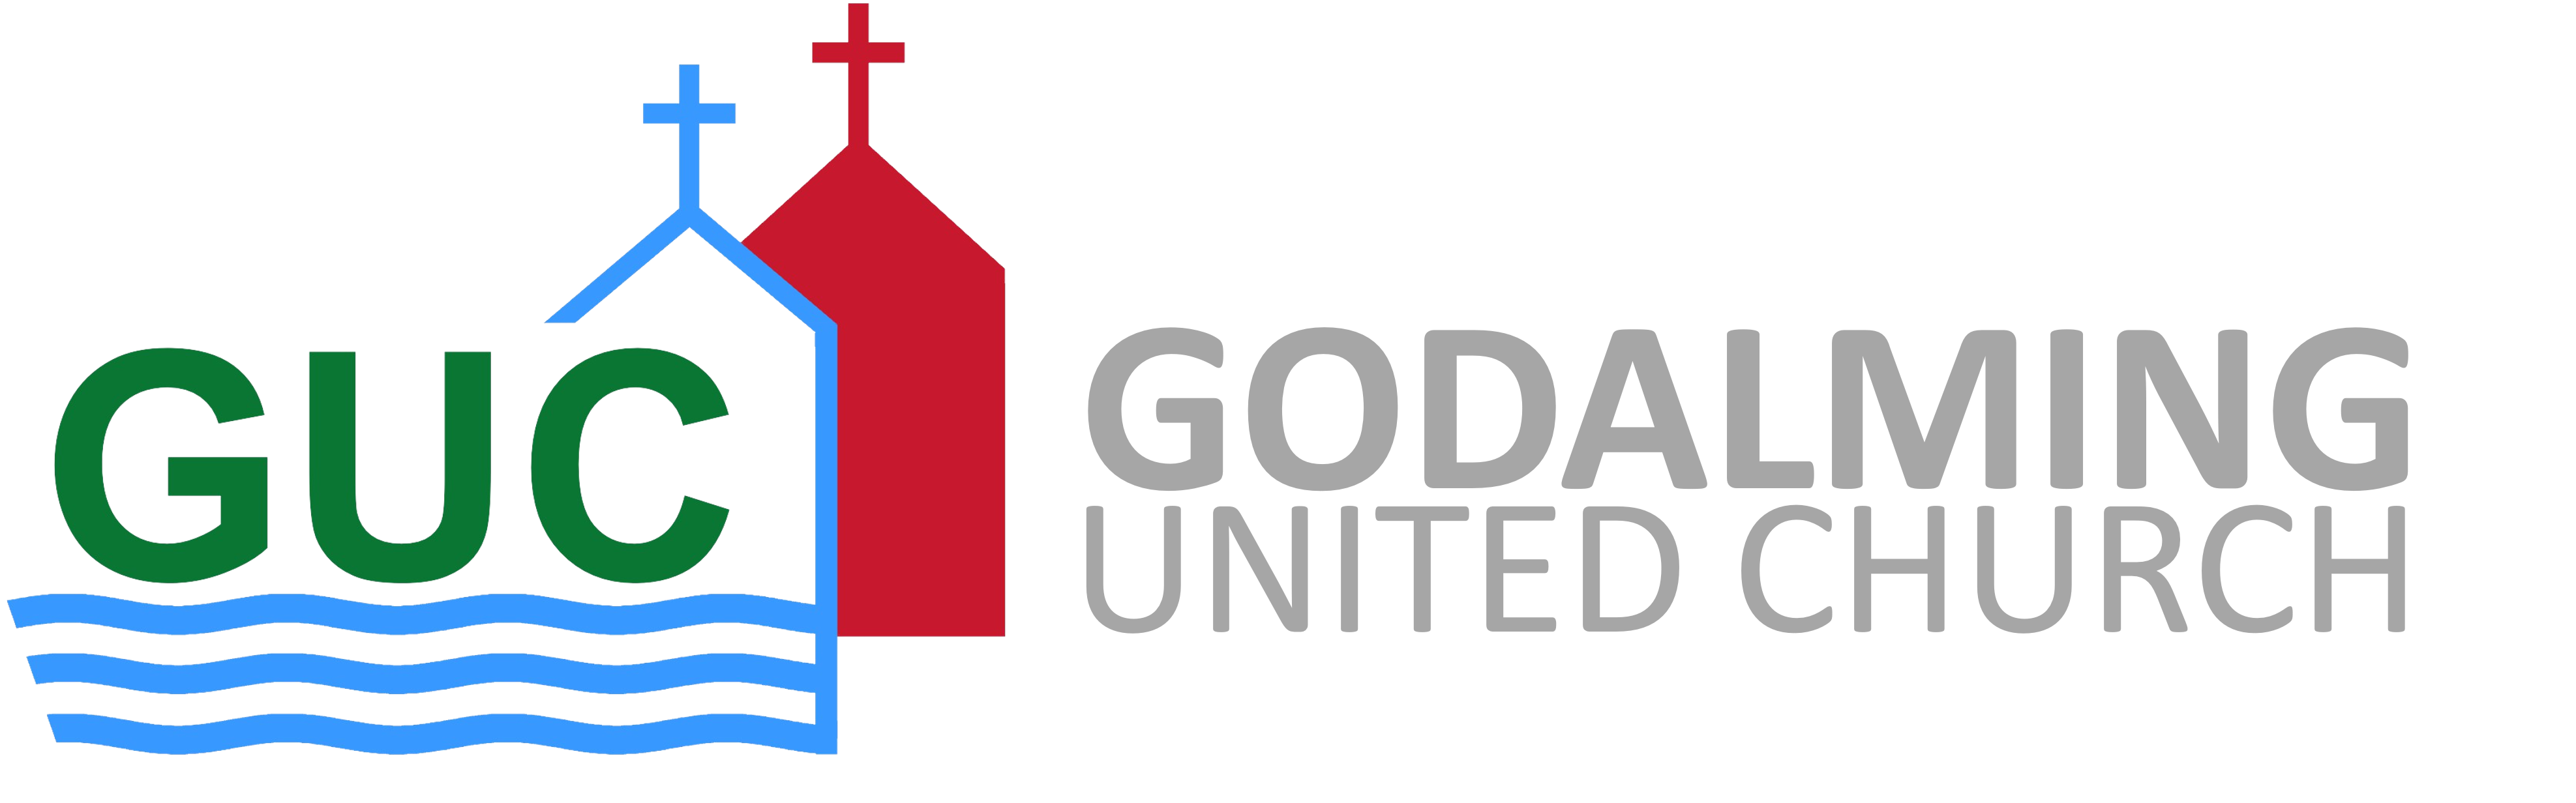 Godalming United Church